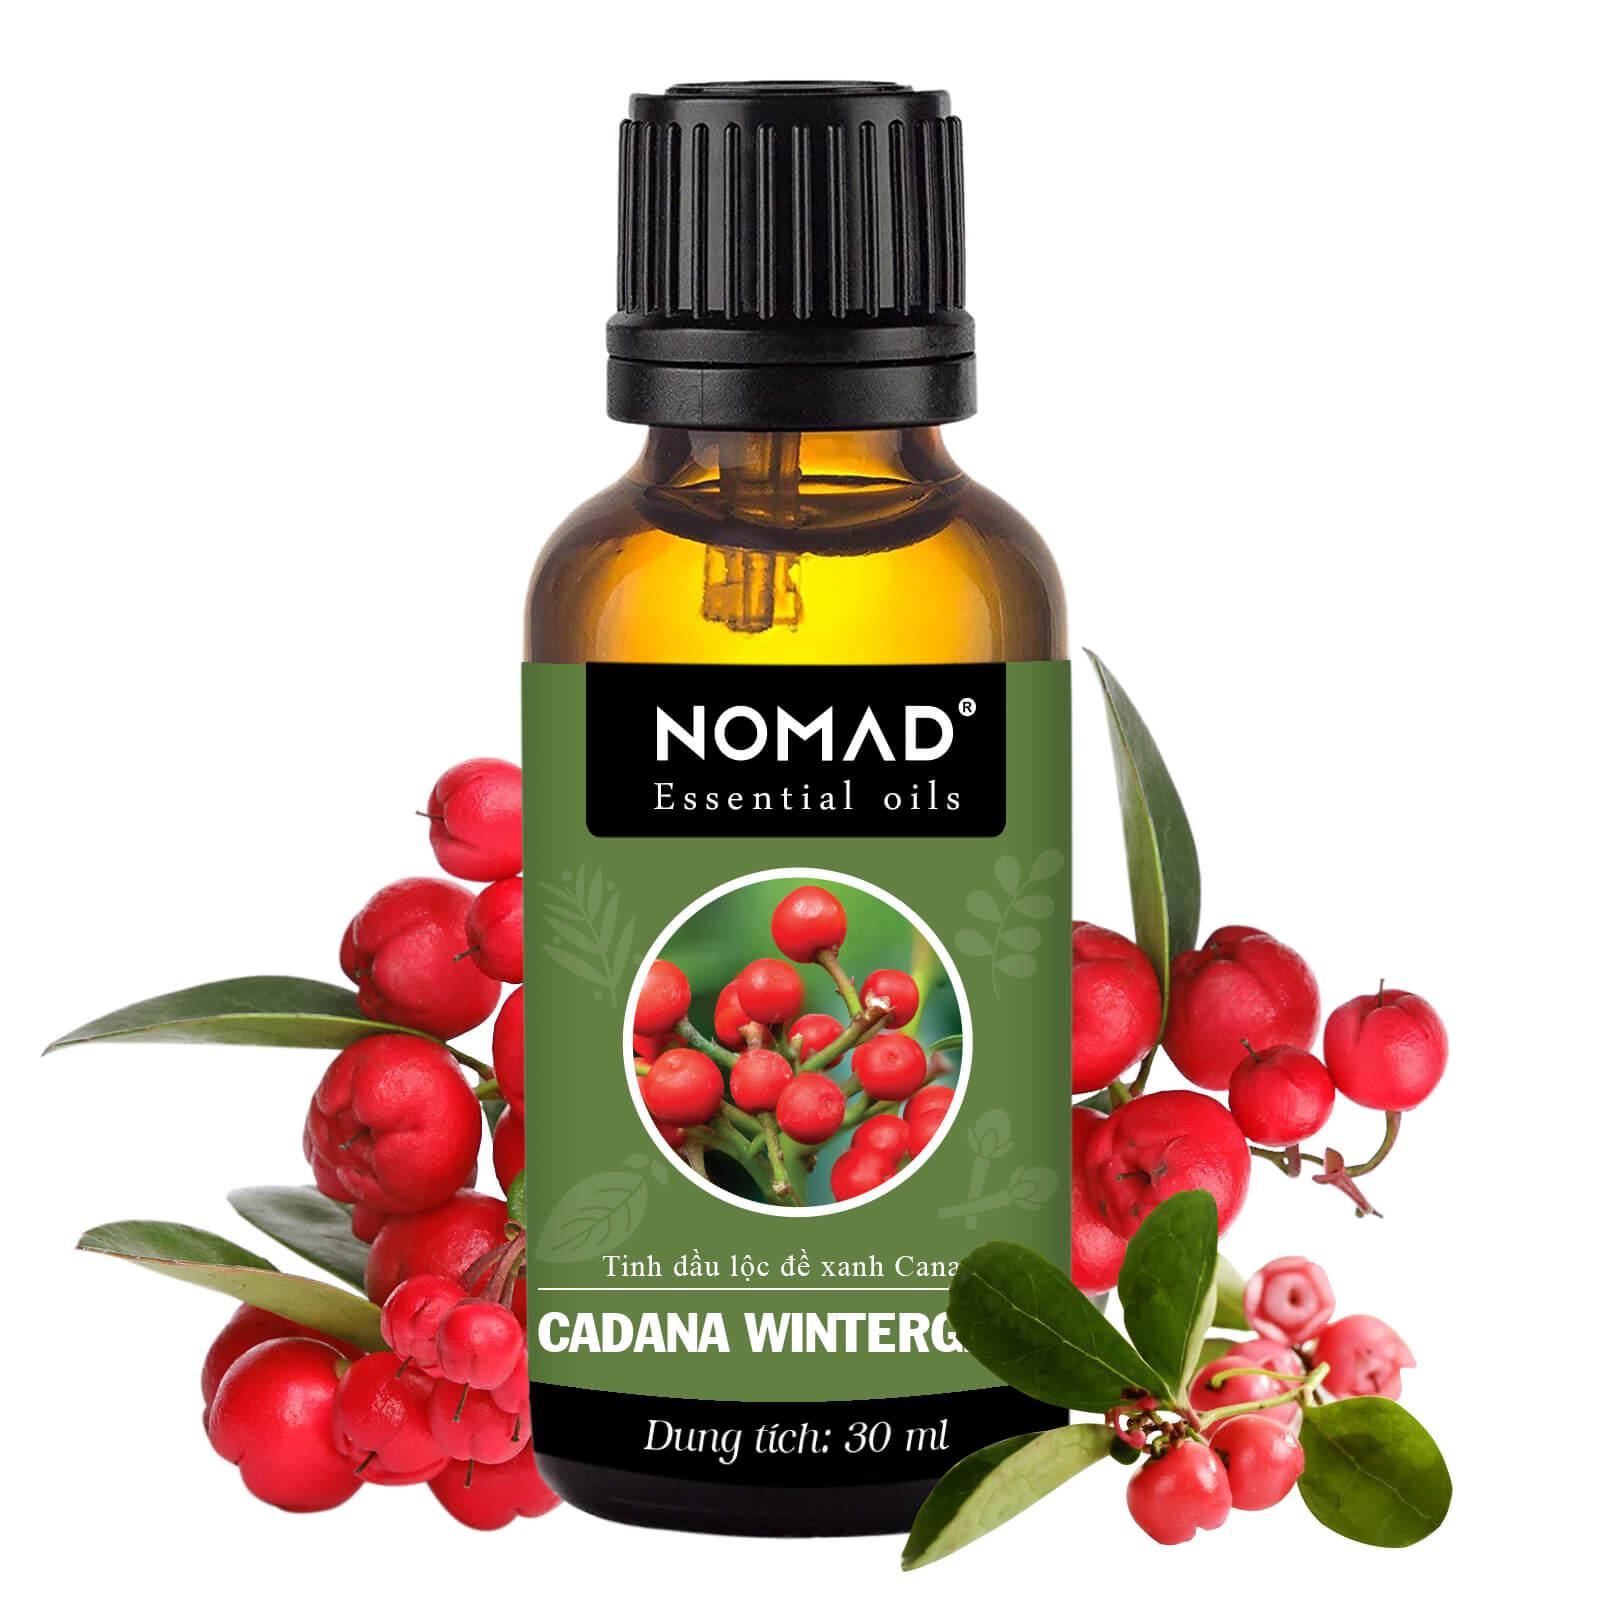 tinh-dau-thien-nhien-loc-de-xanh-nomad-essential-oil-blend-canada-wintergreen